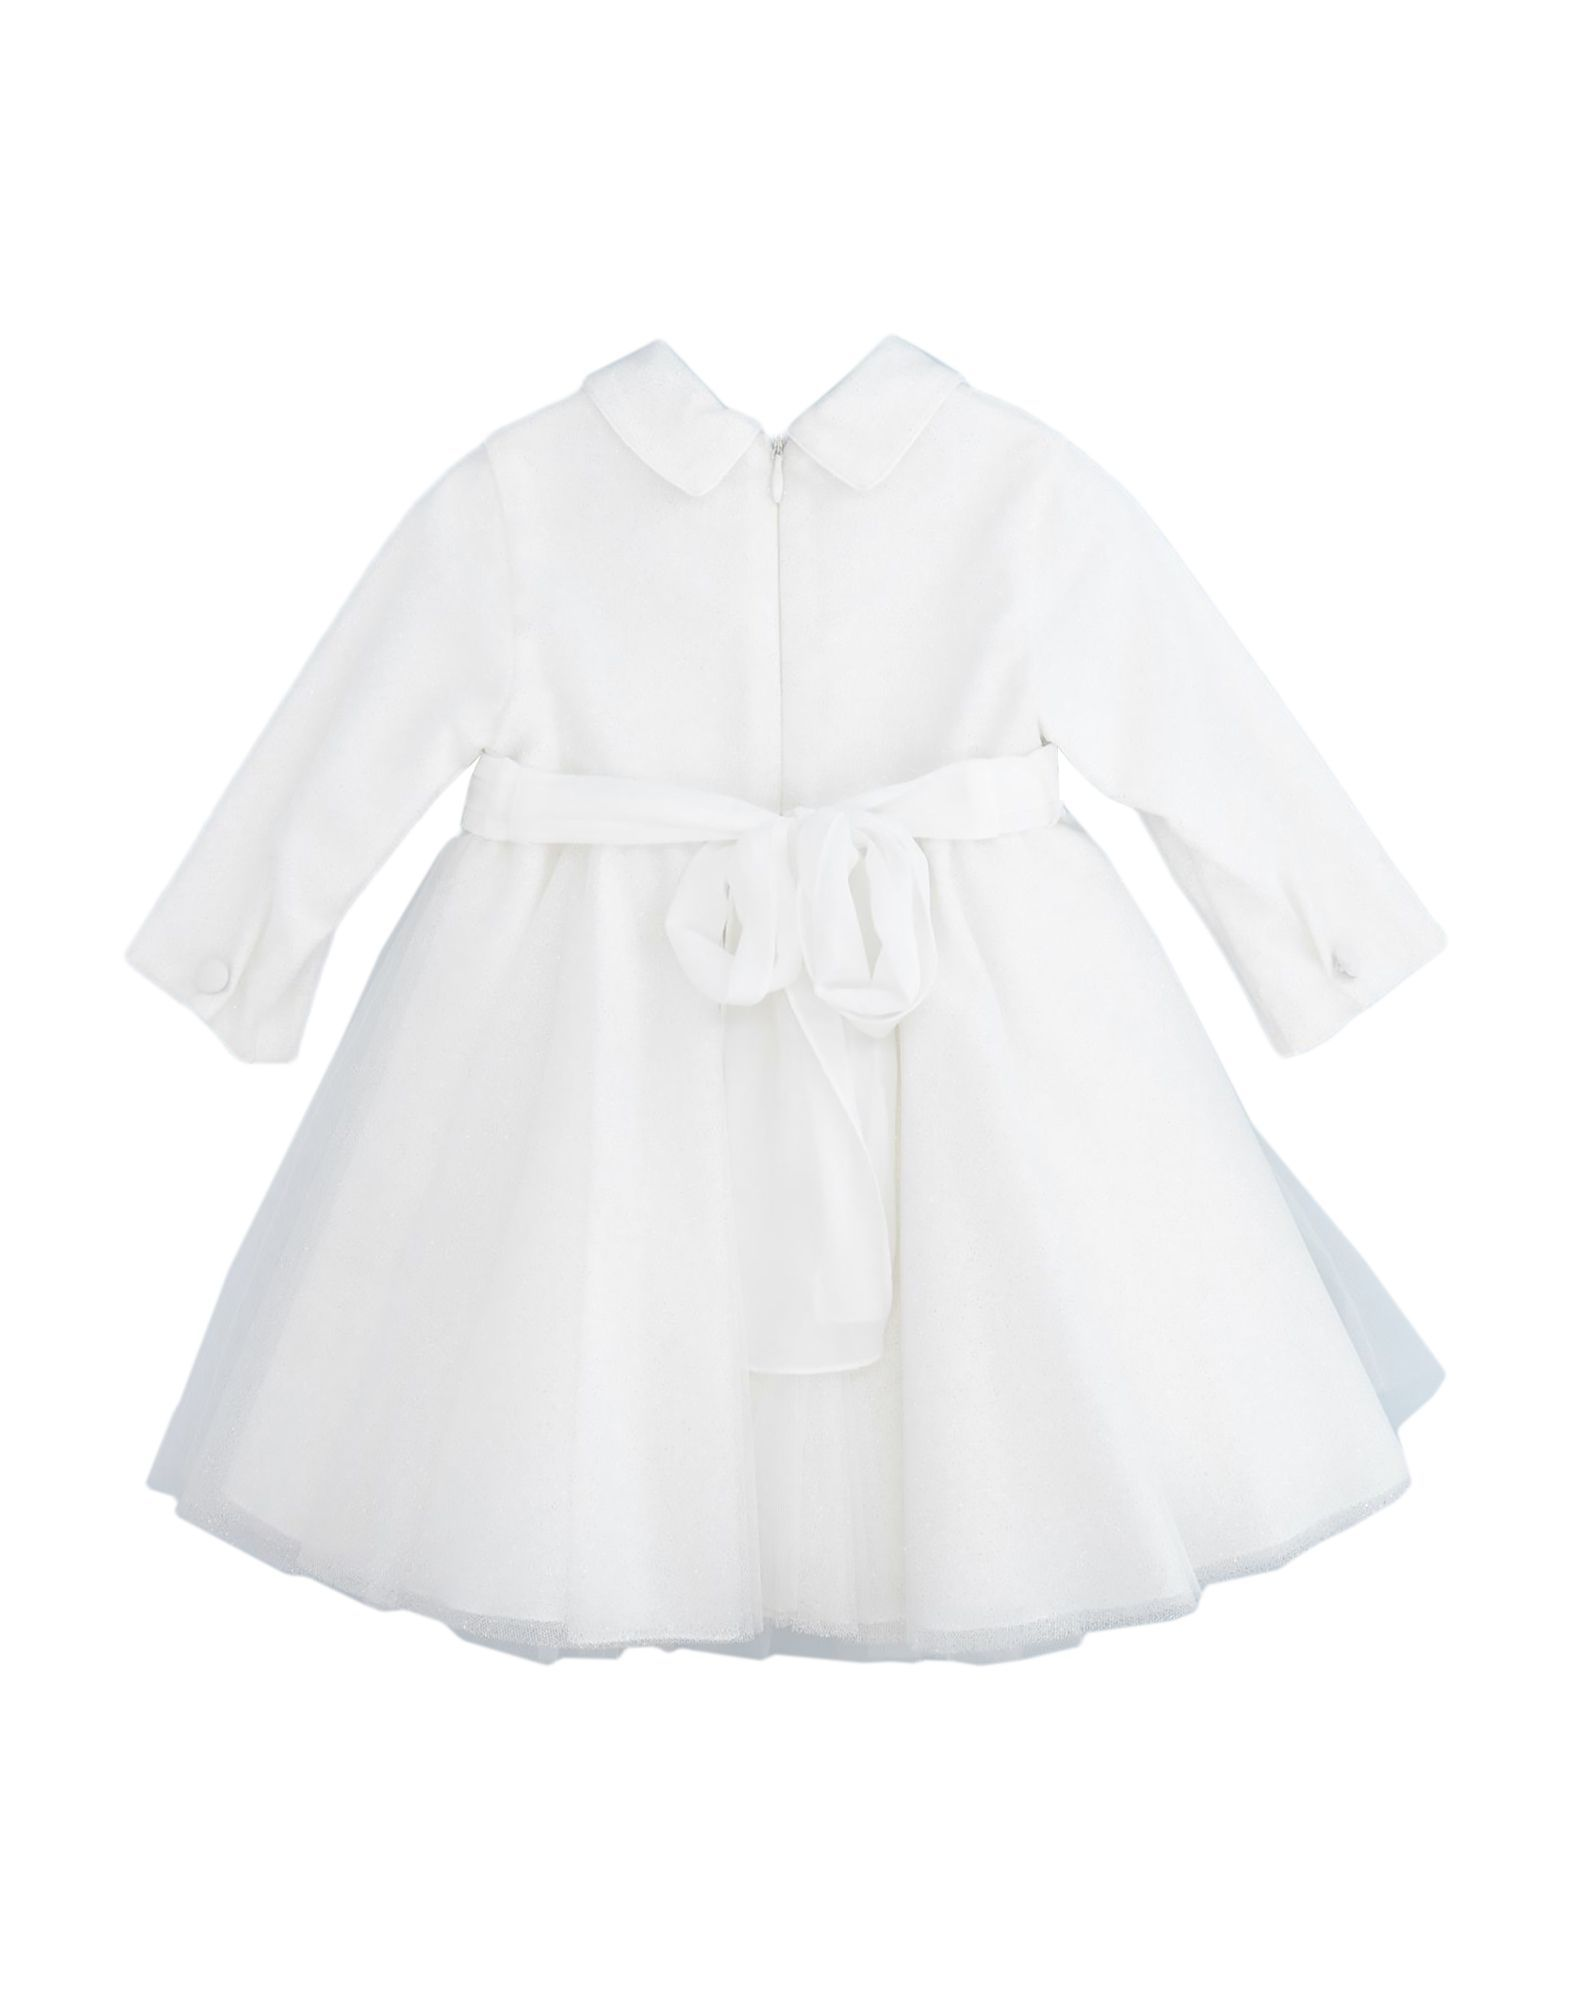 Aletta Girls' White Cotton Dress